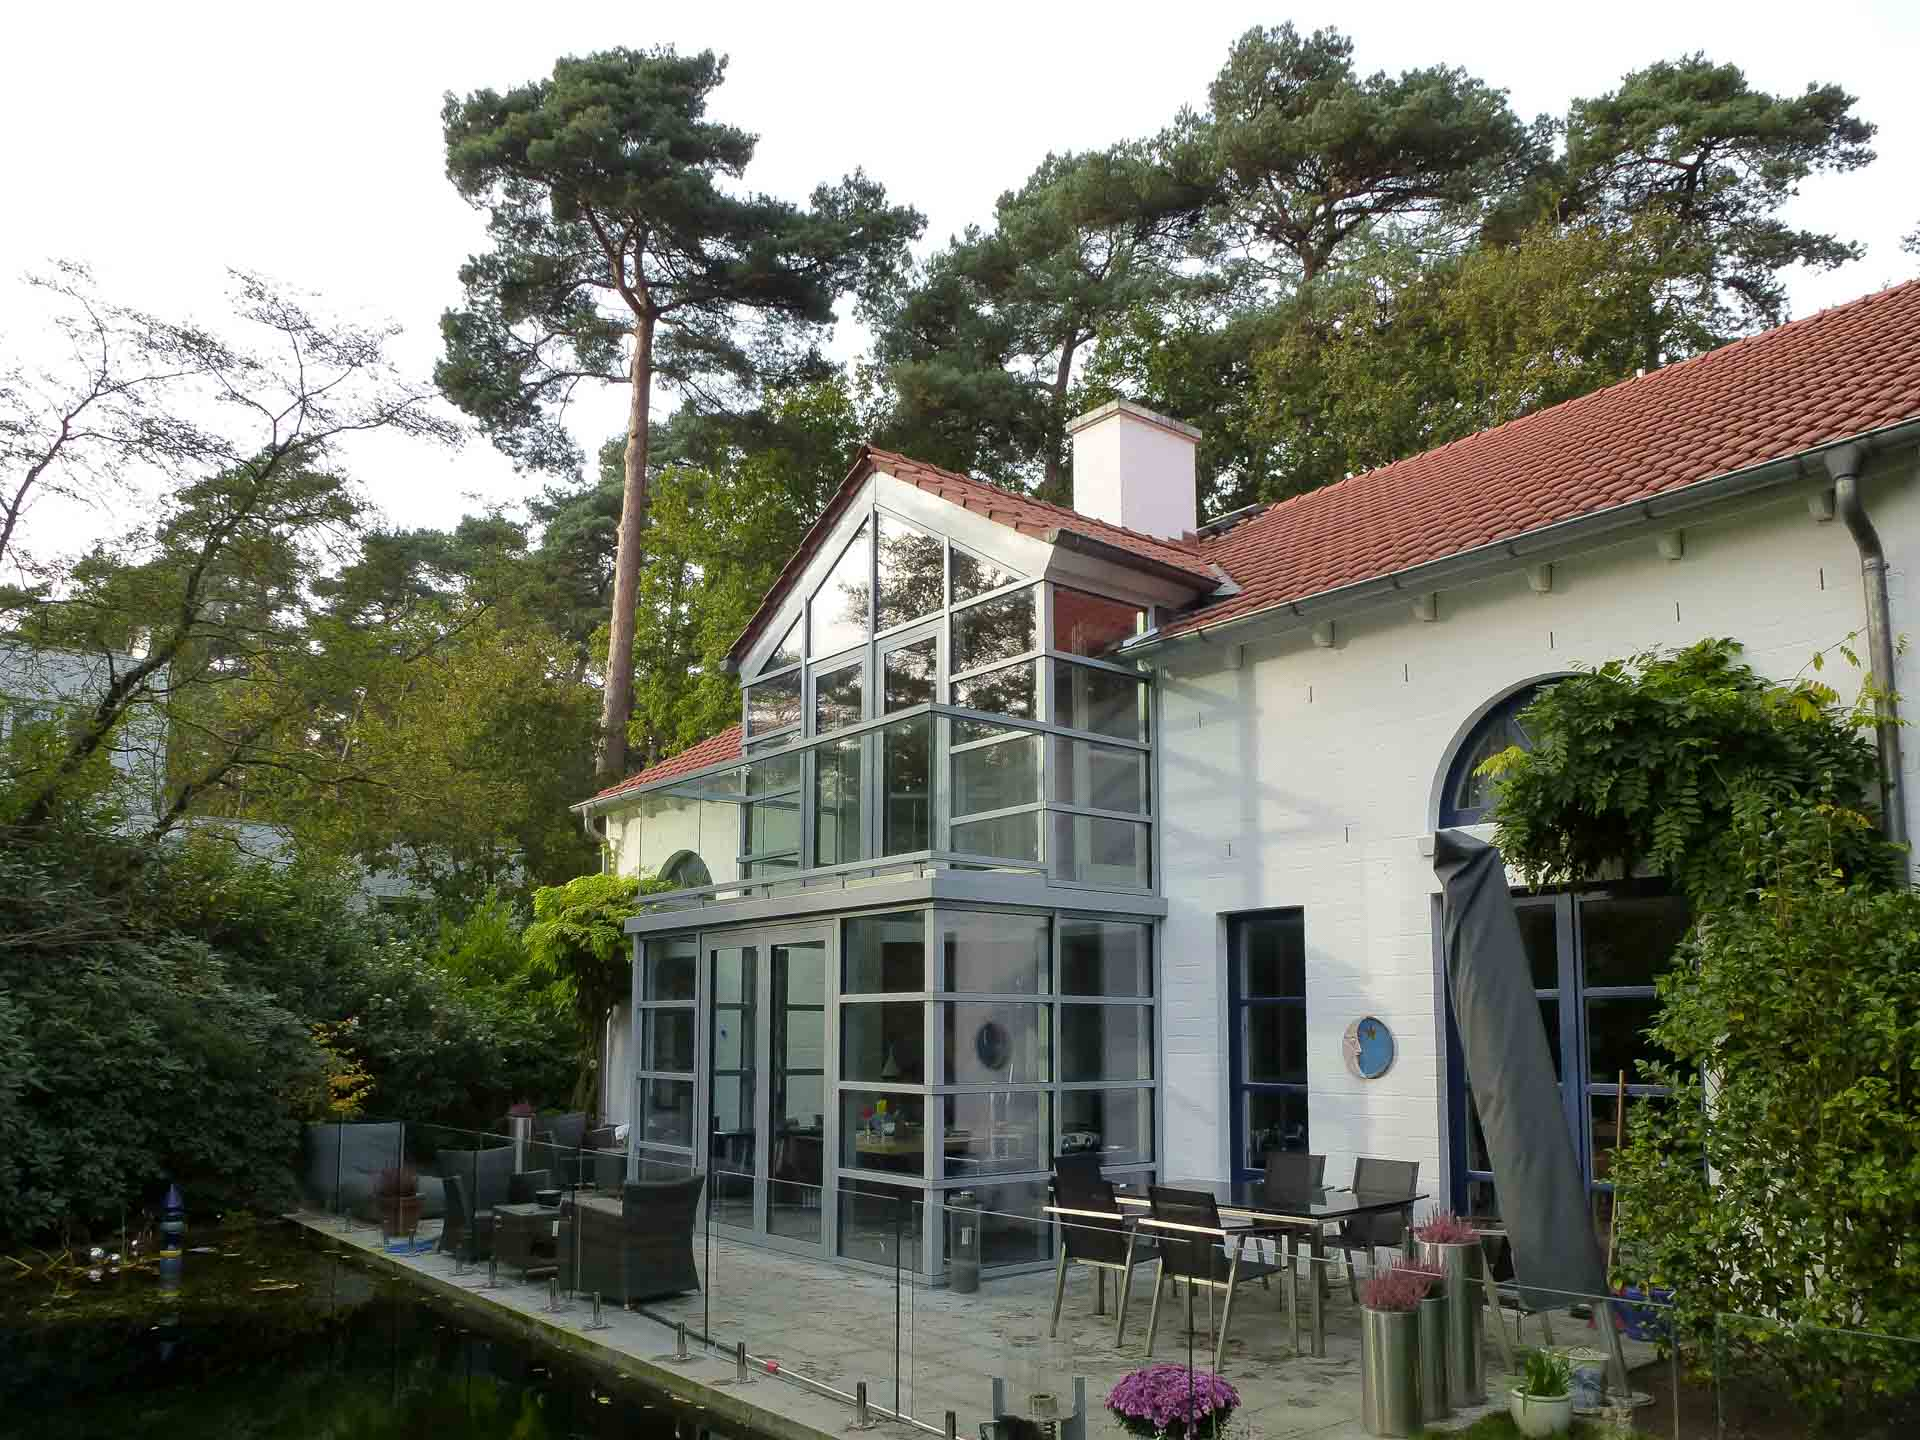 Holz-Wintergarten modernisieren